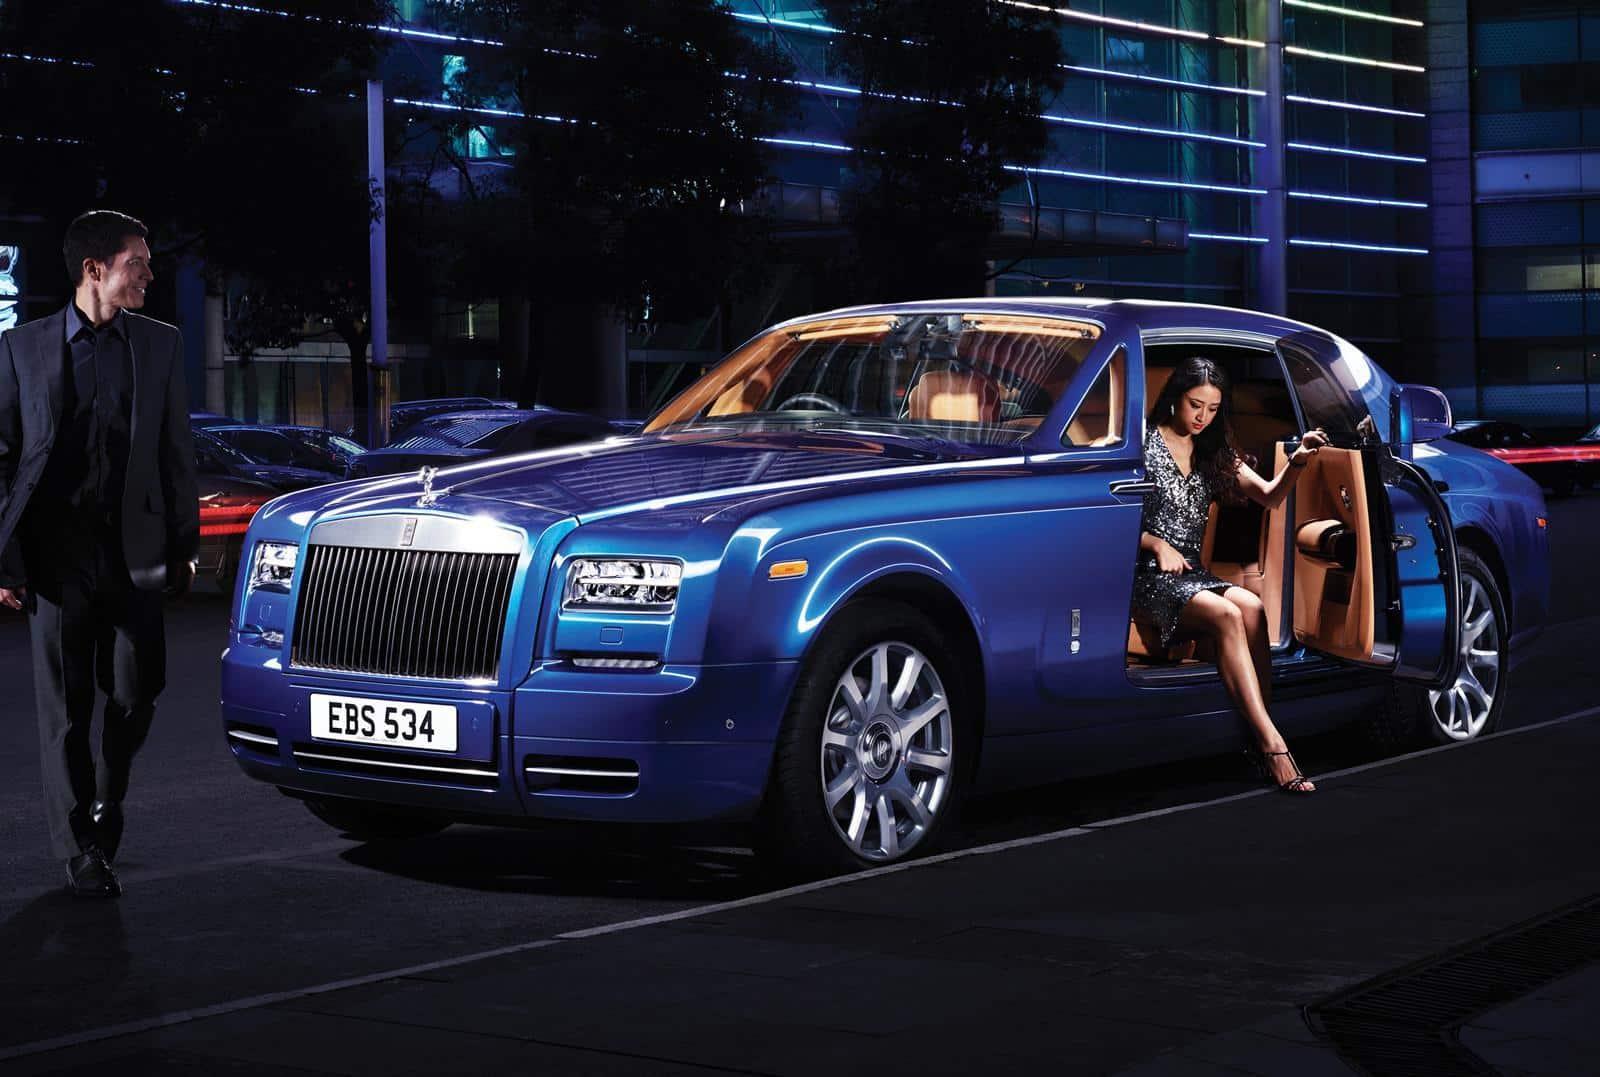 Rolls Royce Wraith Msrp >> New Rolls Royce Phantom Series II Unveiled